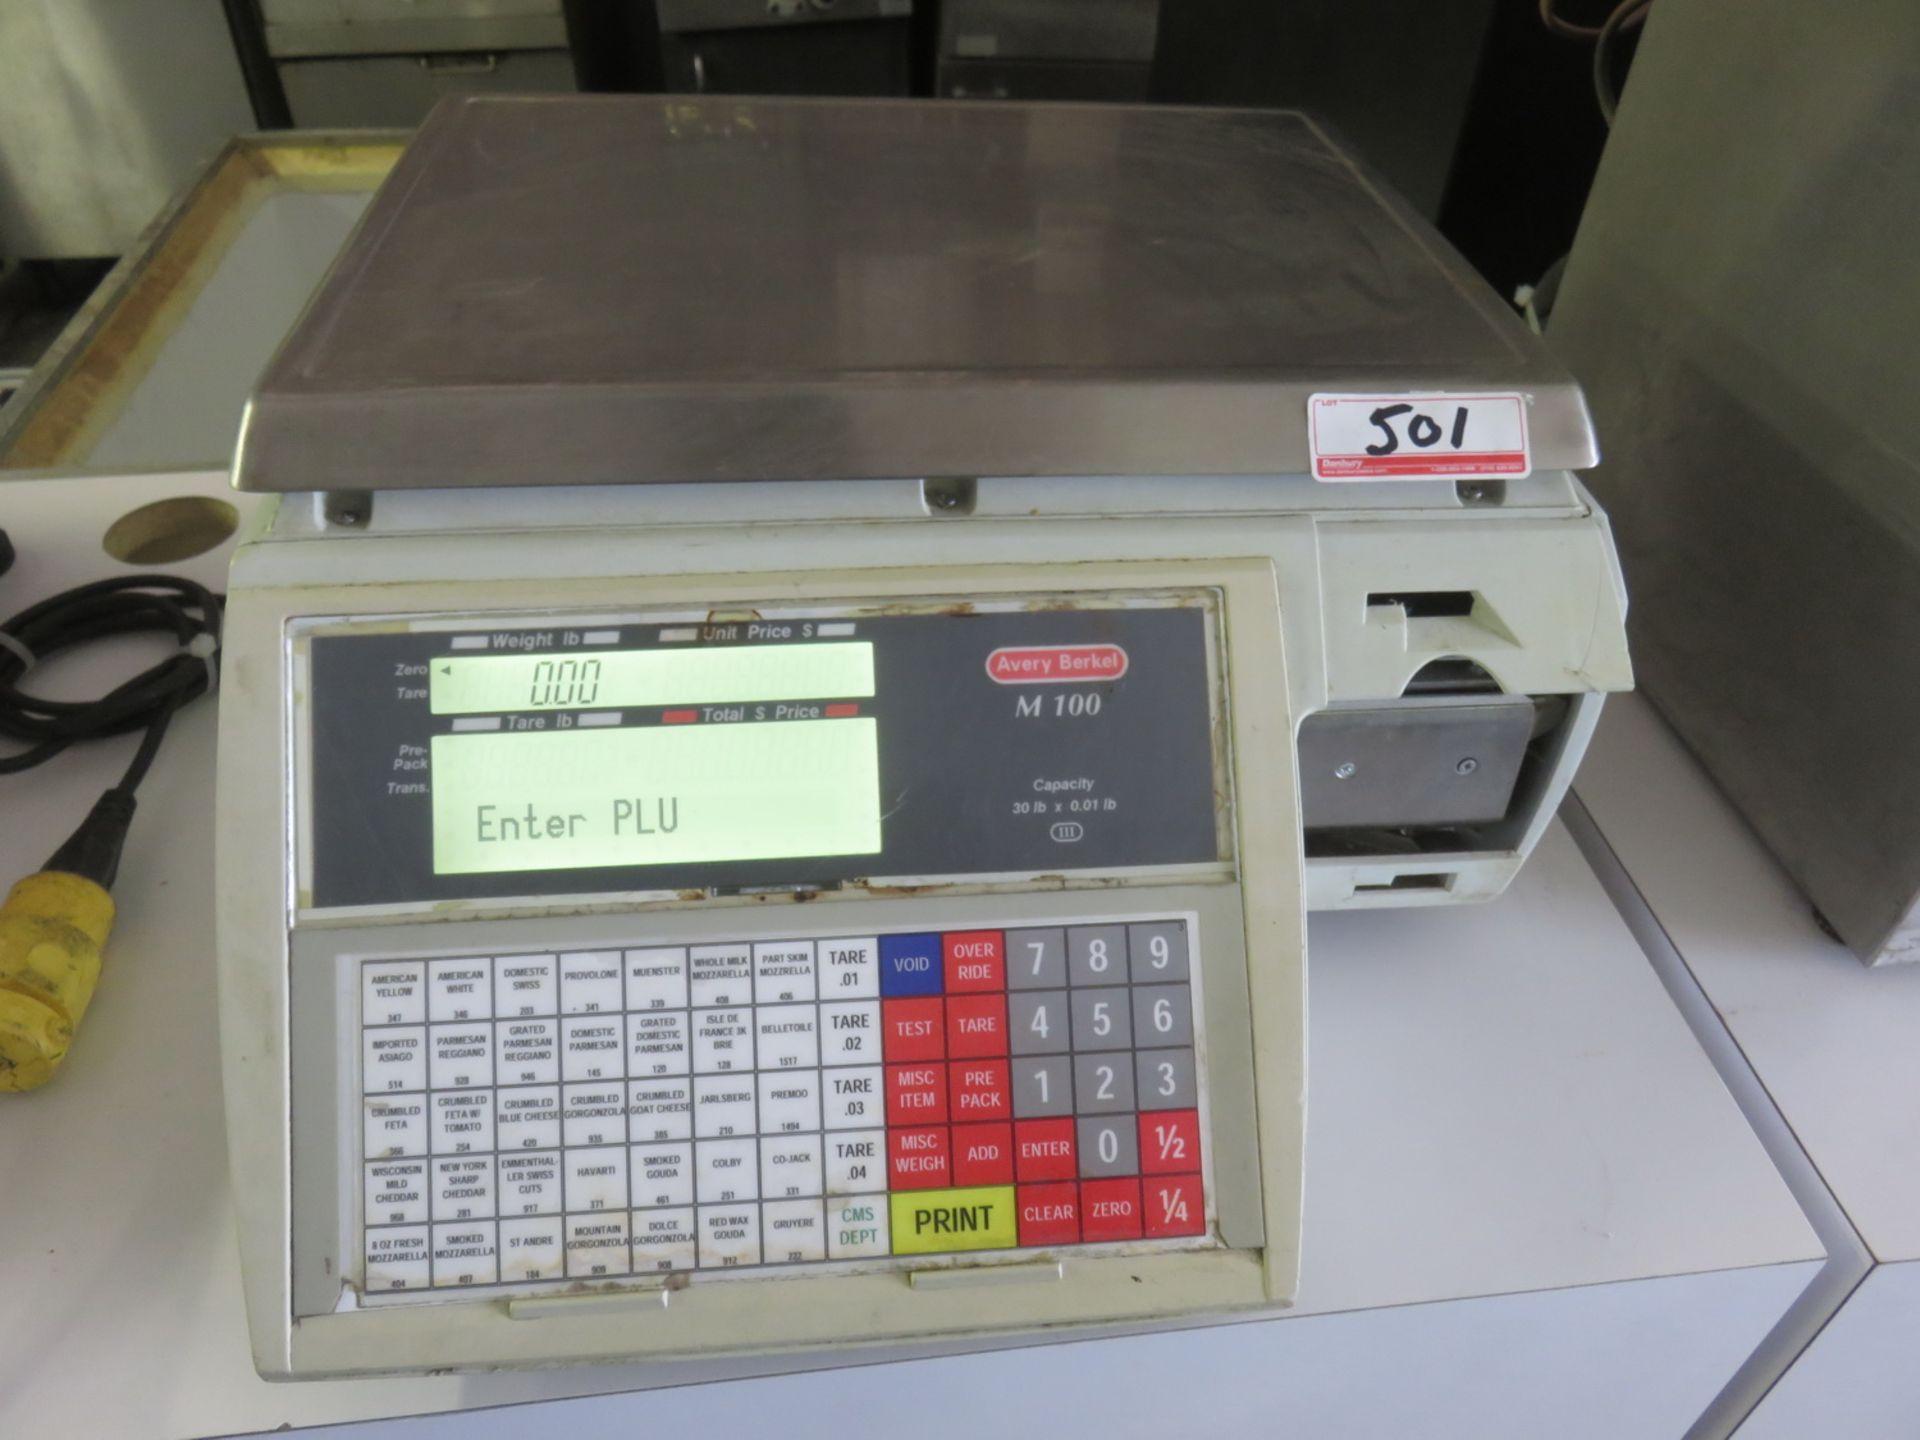 "Lot 501 - AVERY BERKEL MOD M-100, 30LB X 0.01LB CAPACITY 12"" X 15"" DIGITAL PRINT OUT SCALE - S/N 05030462"